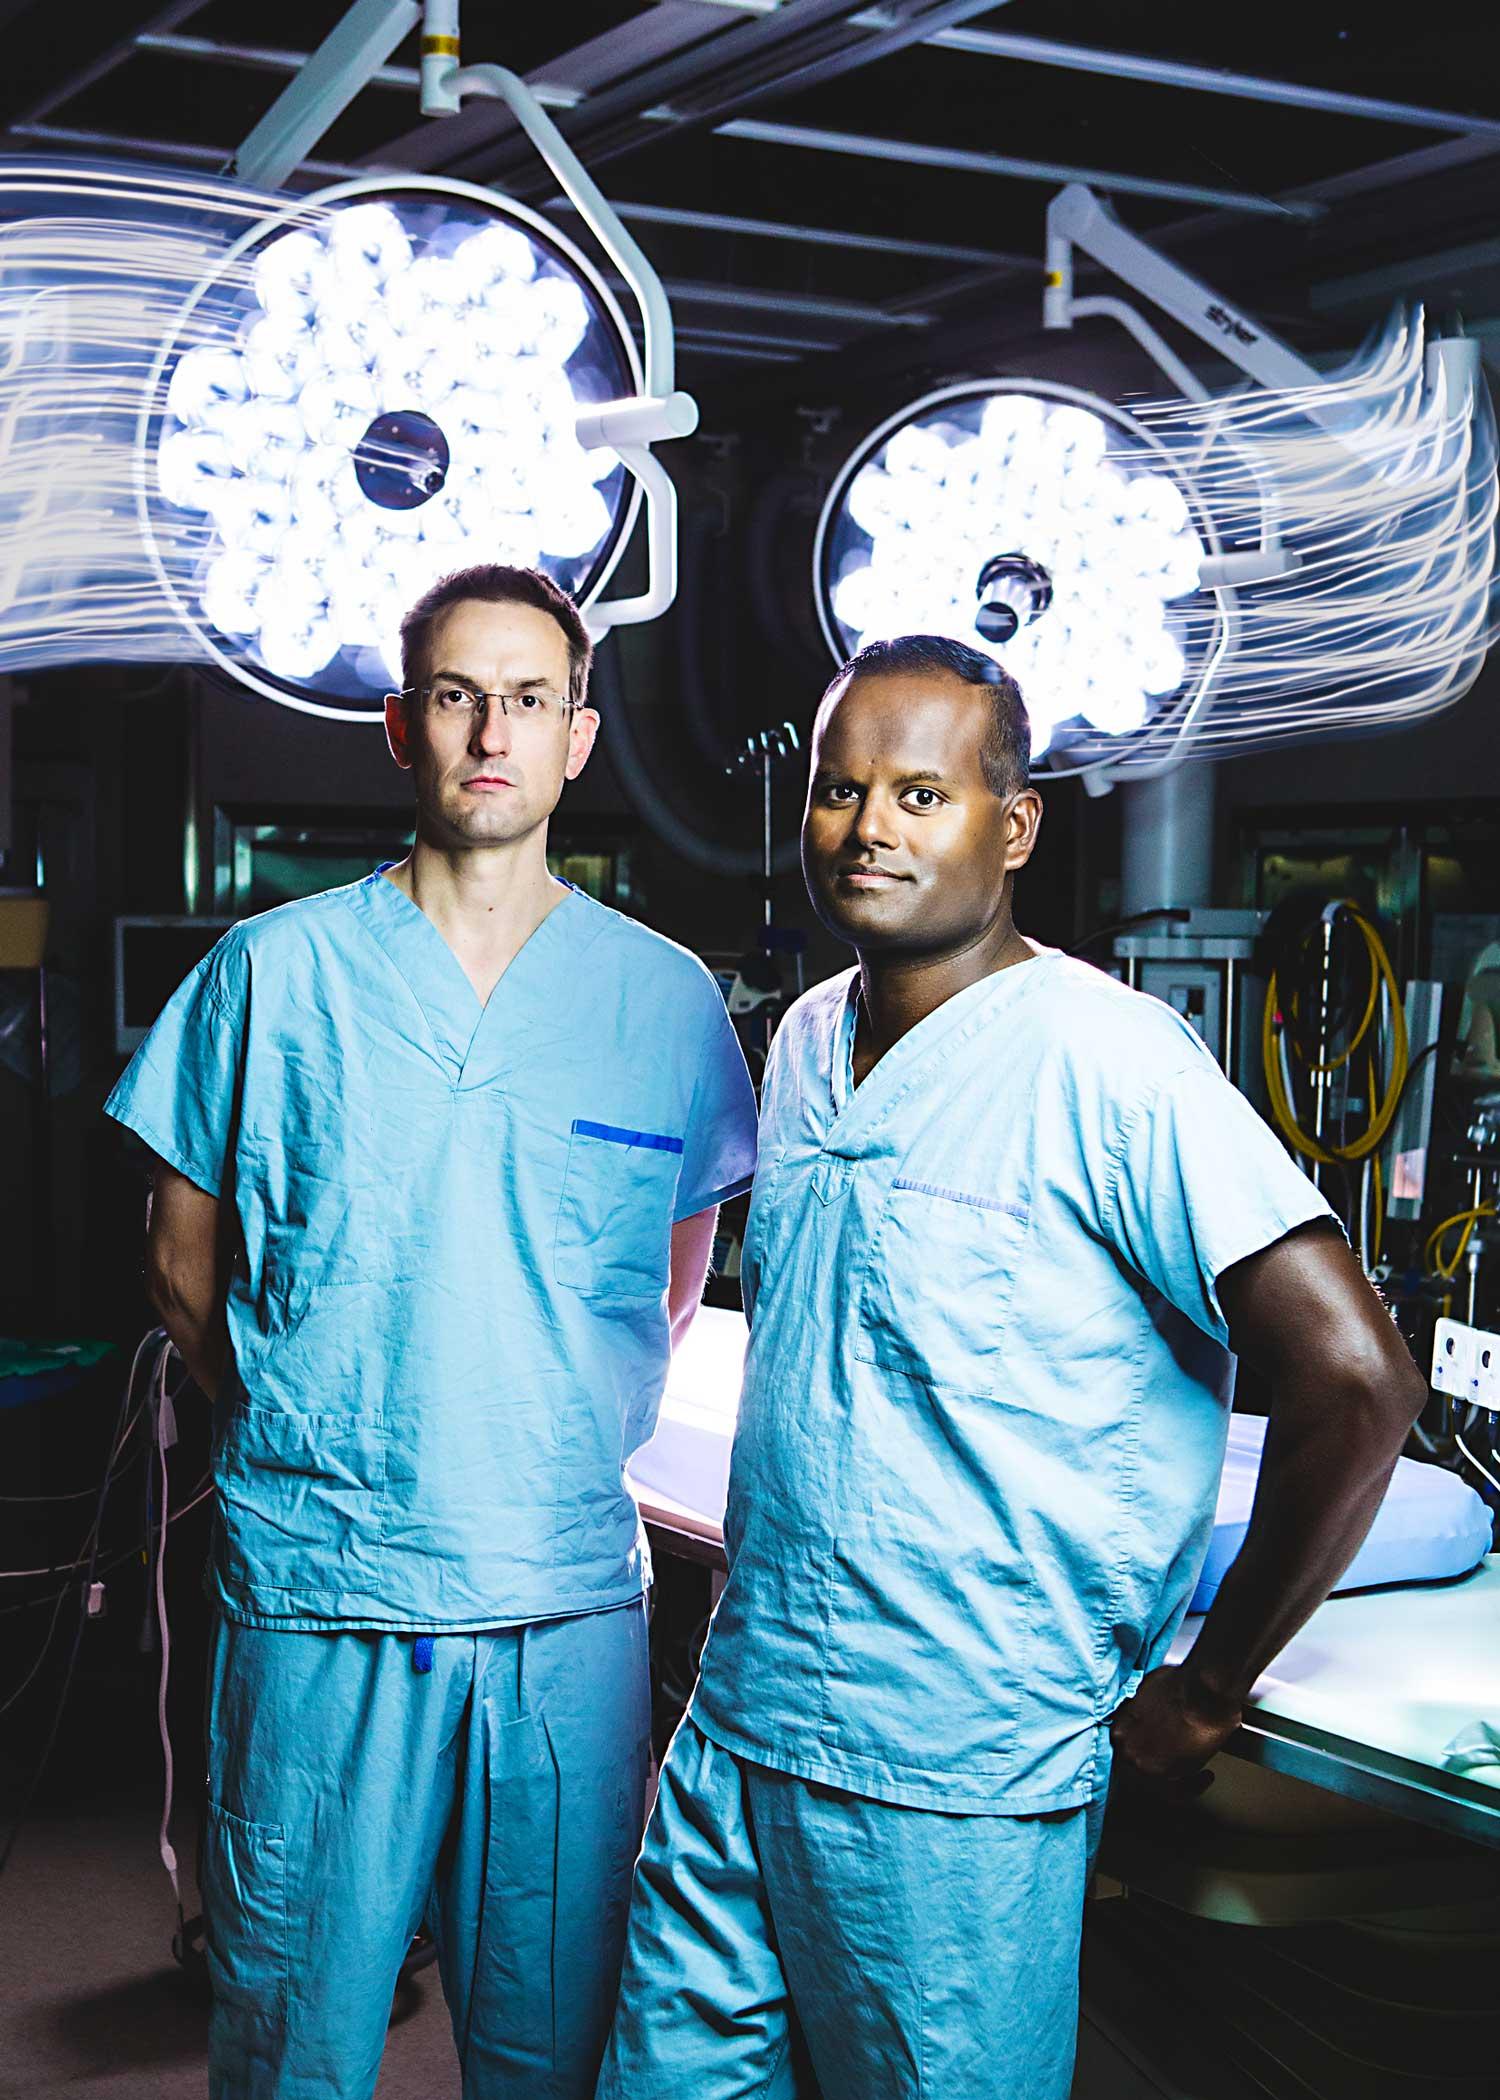 Surgery professors Darren Freed (left) and Jayan Nagendran